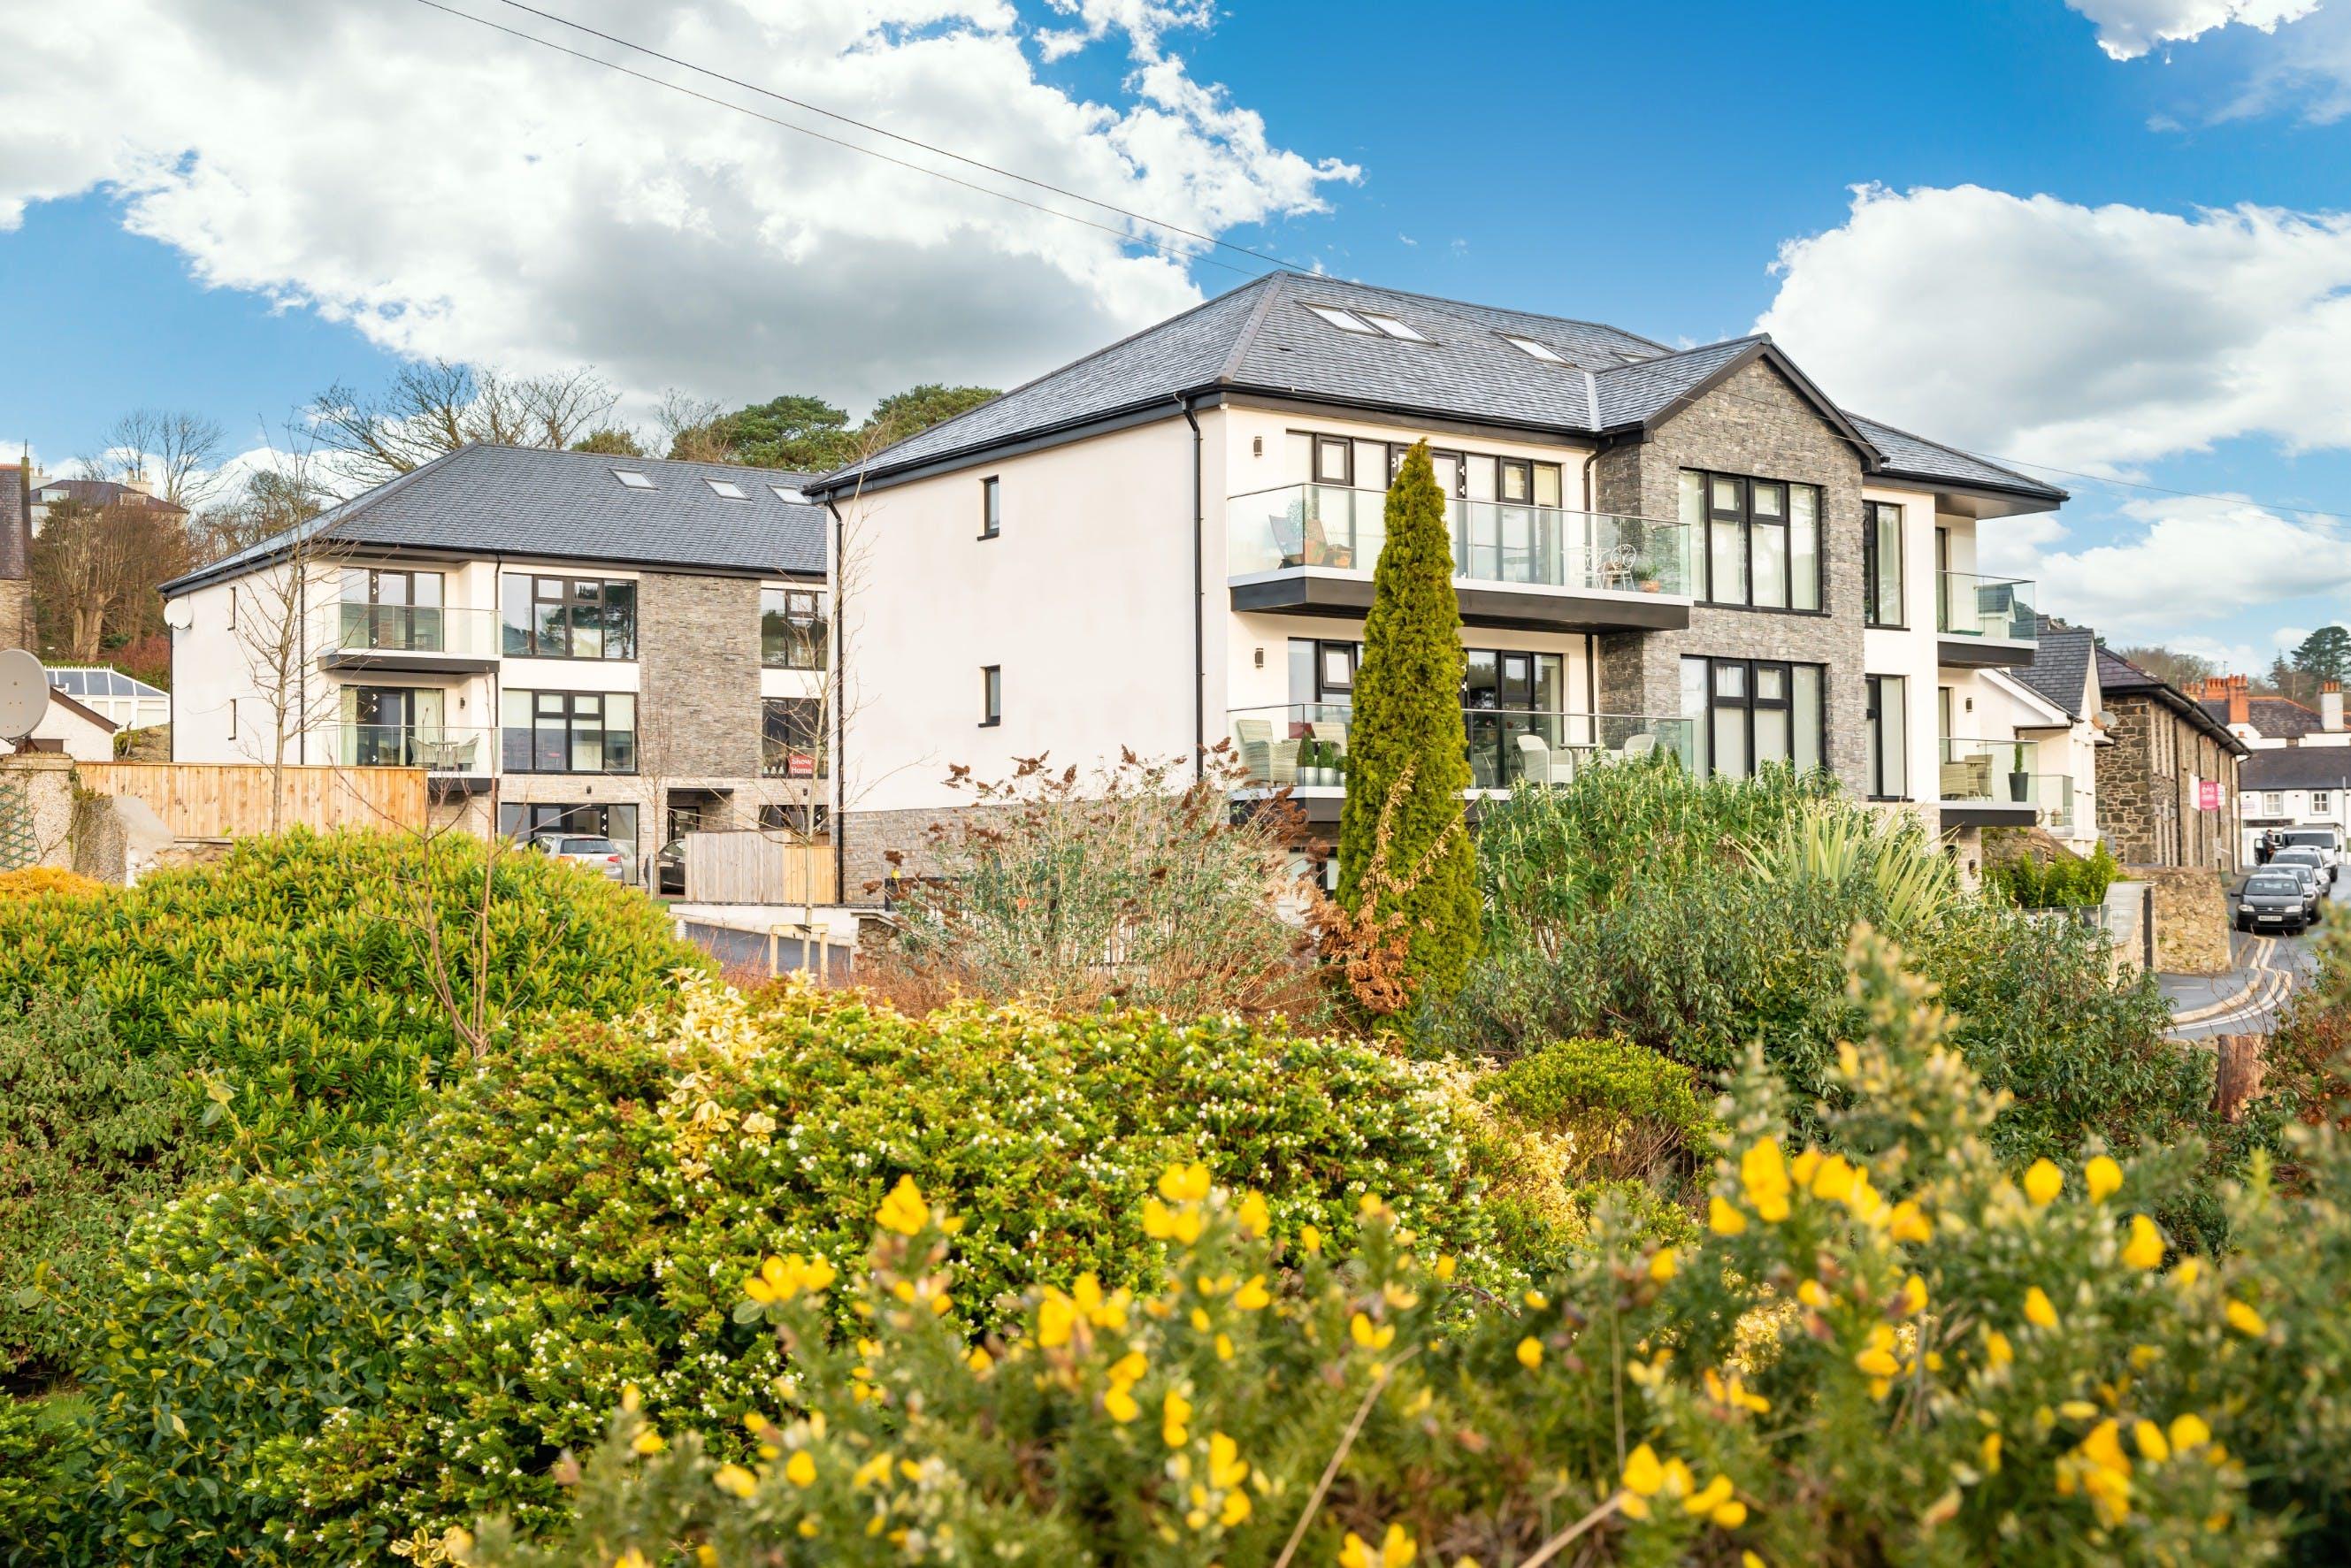 Min Y Don, Water Street, Menai Bridge, Anglesey, Residential For Sale - _SKY4271-Edit.jpg